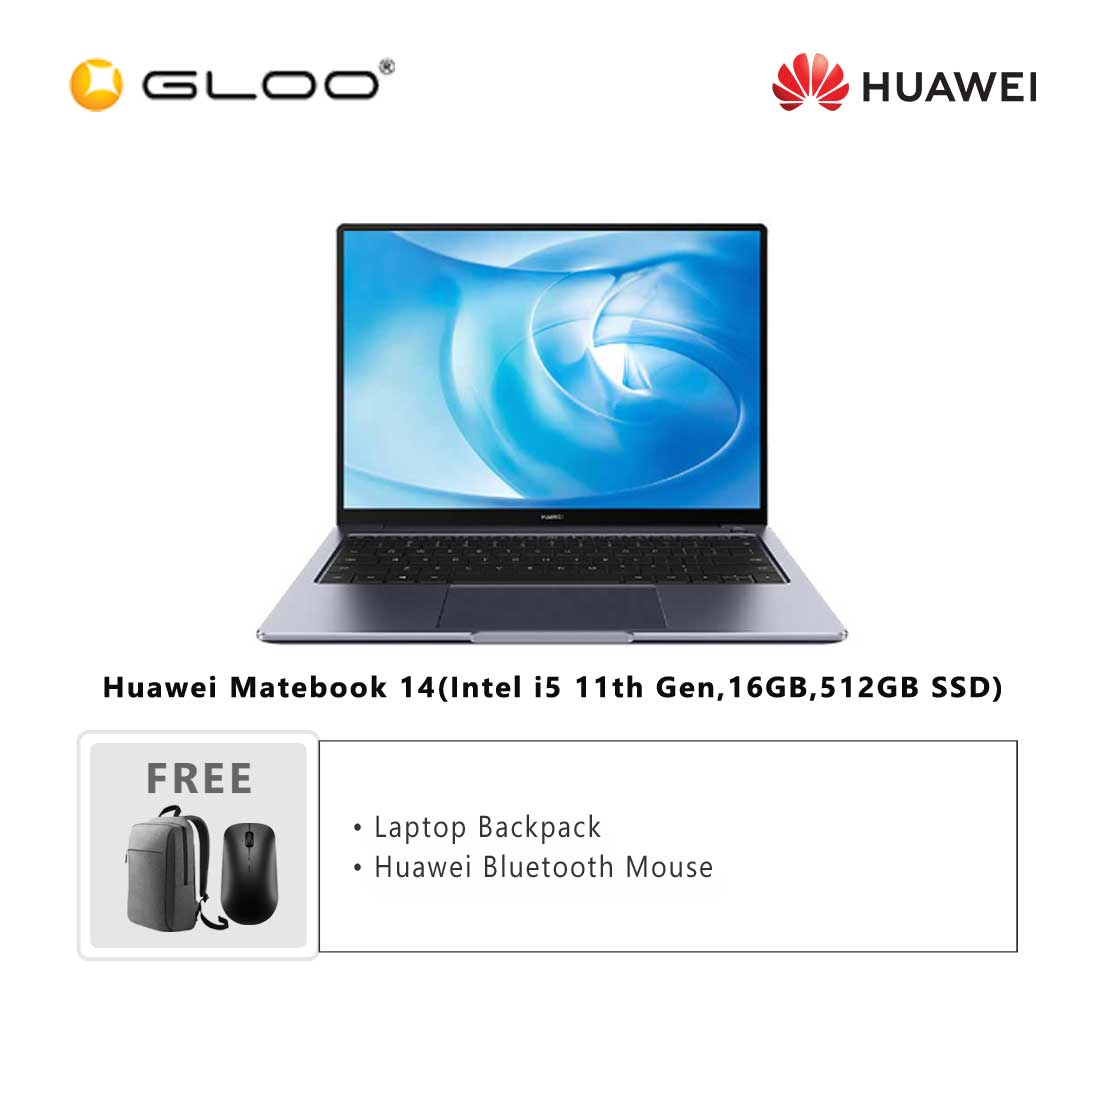 Huawei Matebook 14(Intel i5 11th Gen,16GB,512GB SSD)-53011PVM + FREE Huawei CD60 Matebook Series Laptop Backpack Grey + FREE Huawei CD20 Bluetooth Mouse Black [BPPHUAWPVMBAGM]